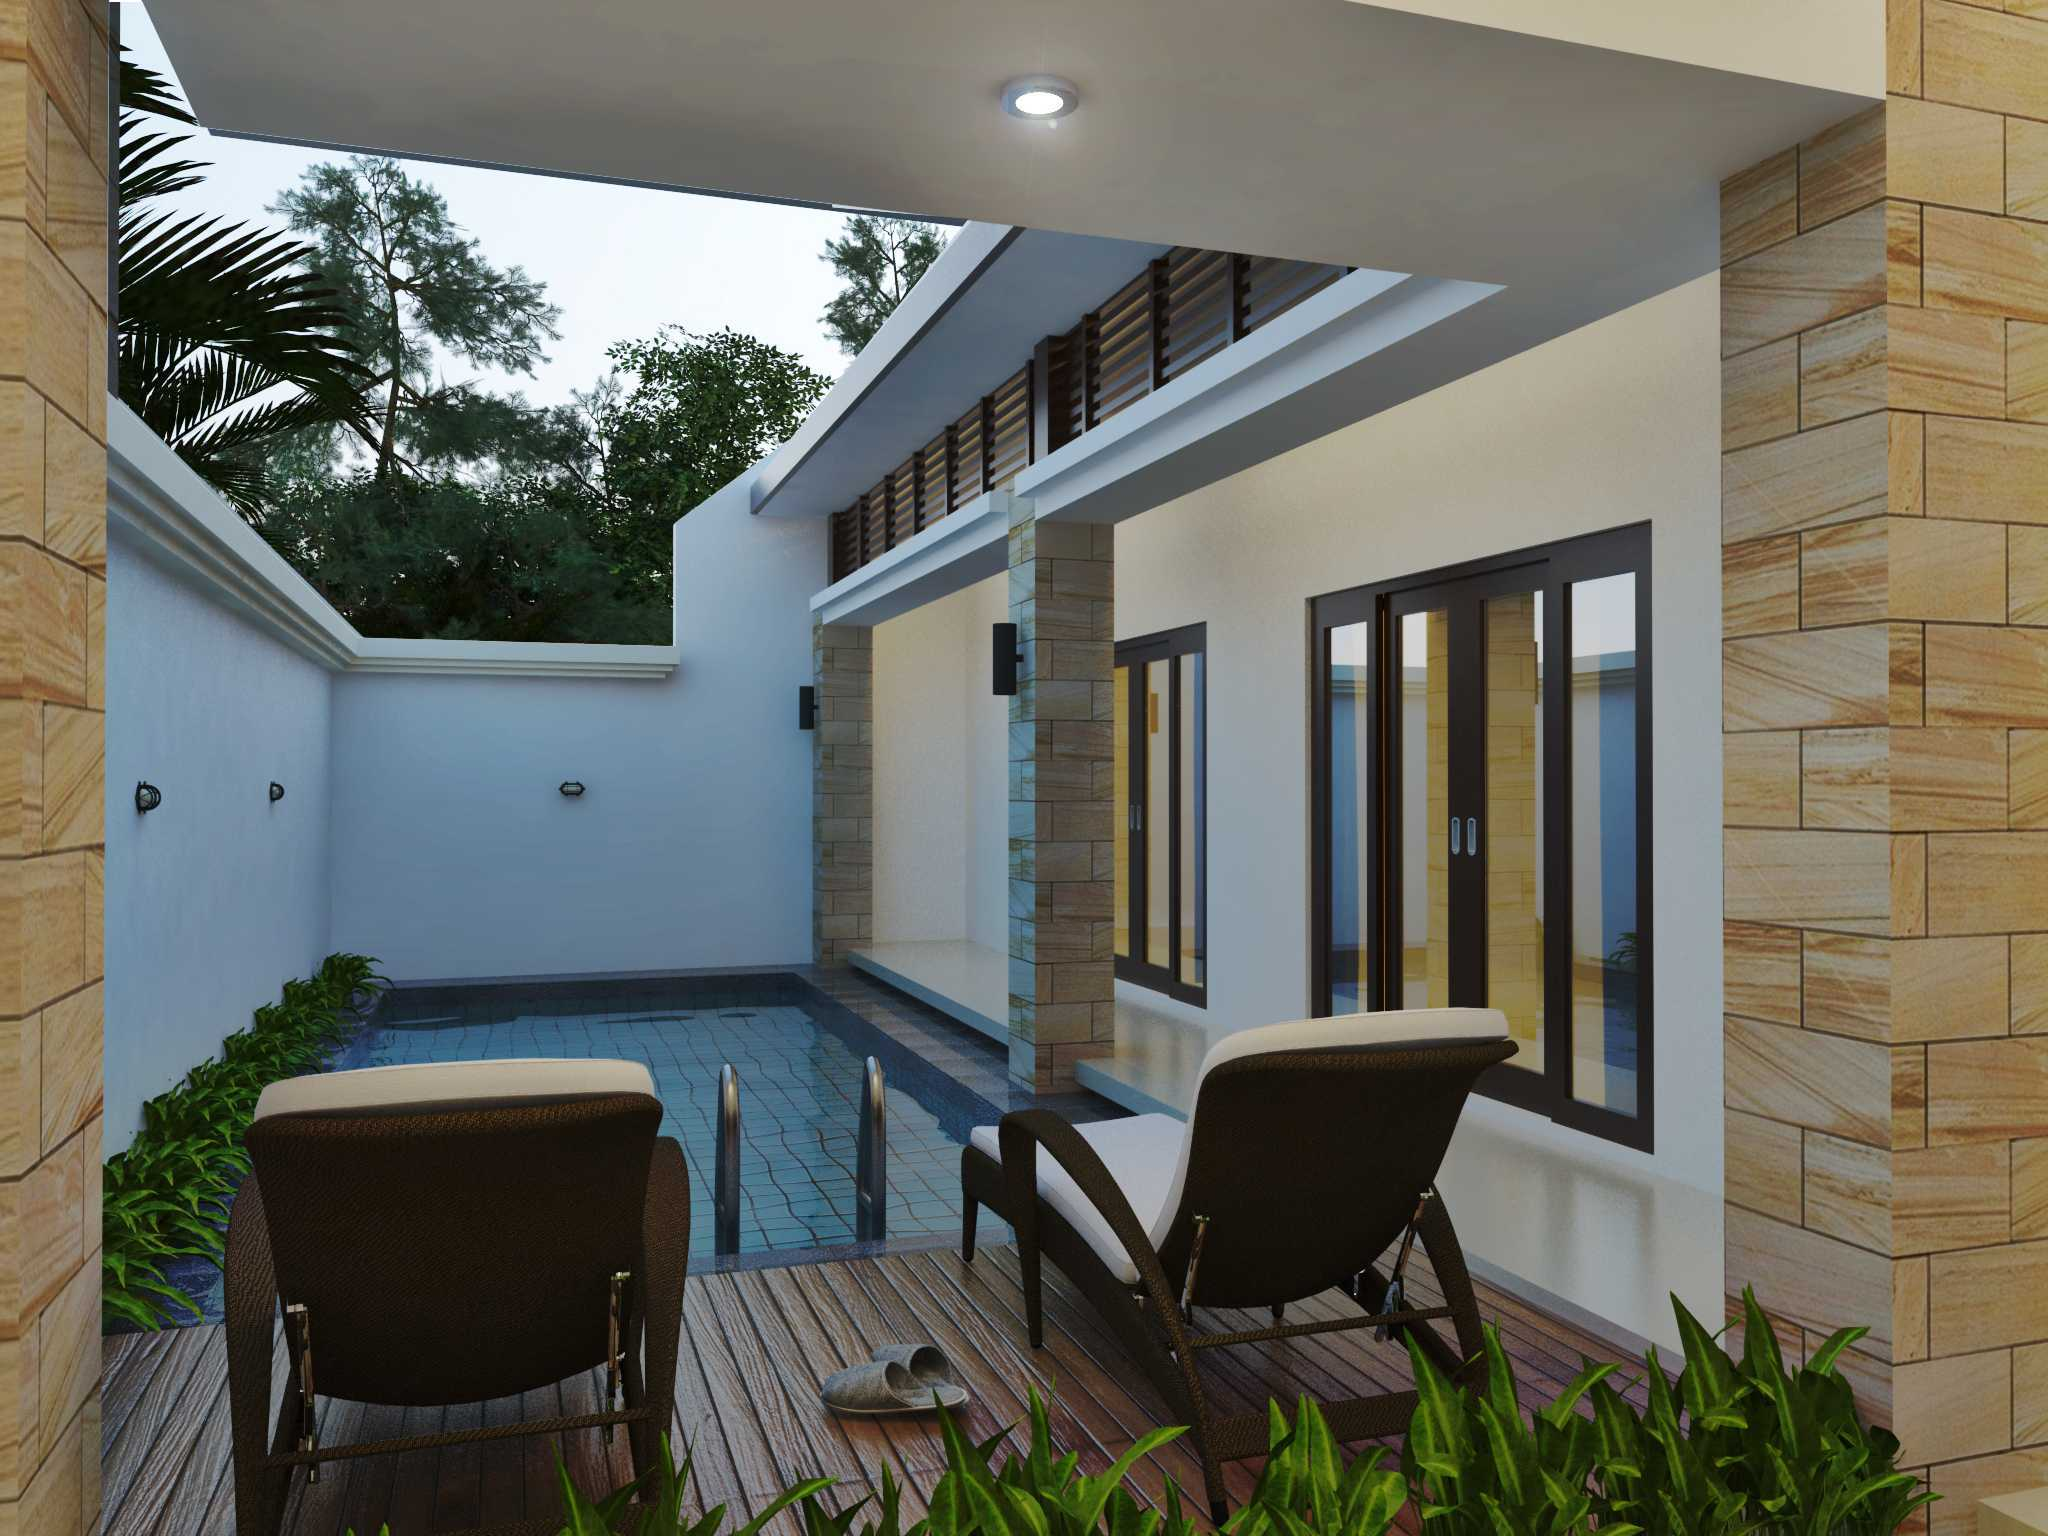 Arsatama Architect Langkung Villa`s - Bali Gianyar, Gianyar Sub-District, Gianyar, Bali, Indonesia Bali, Indonesia View-Poollangkung-Villas   23623